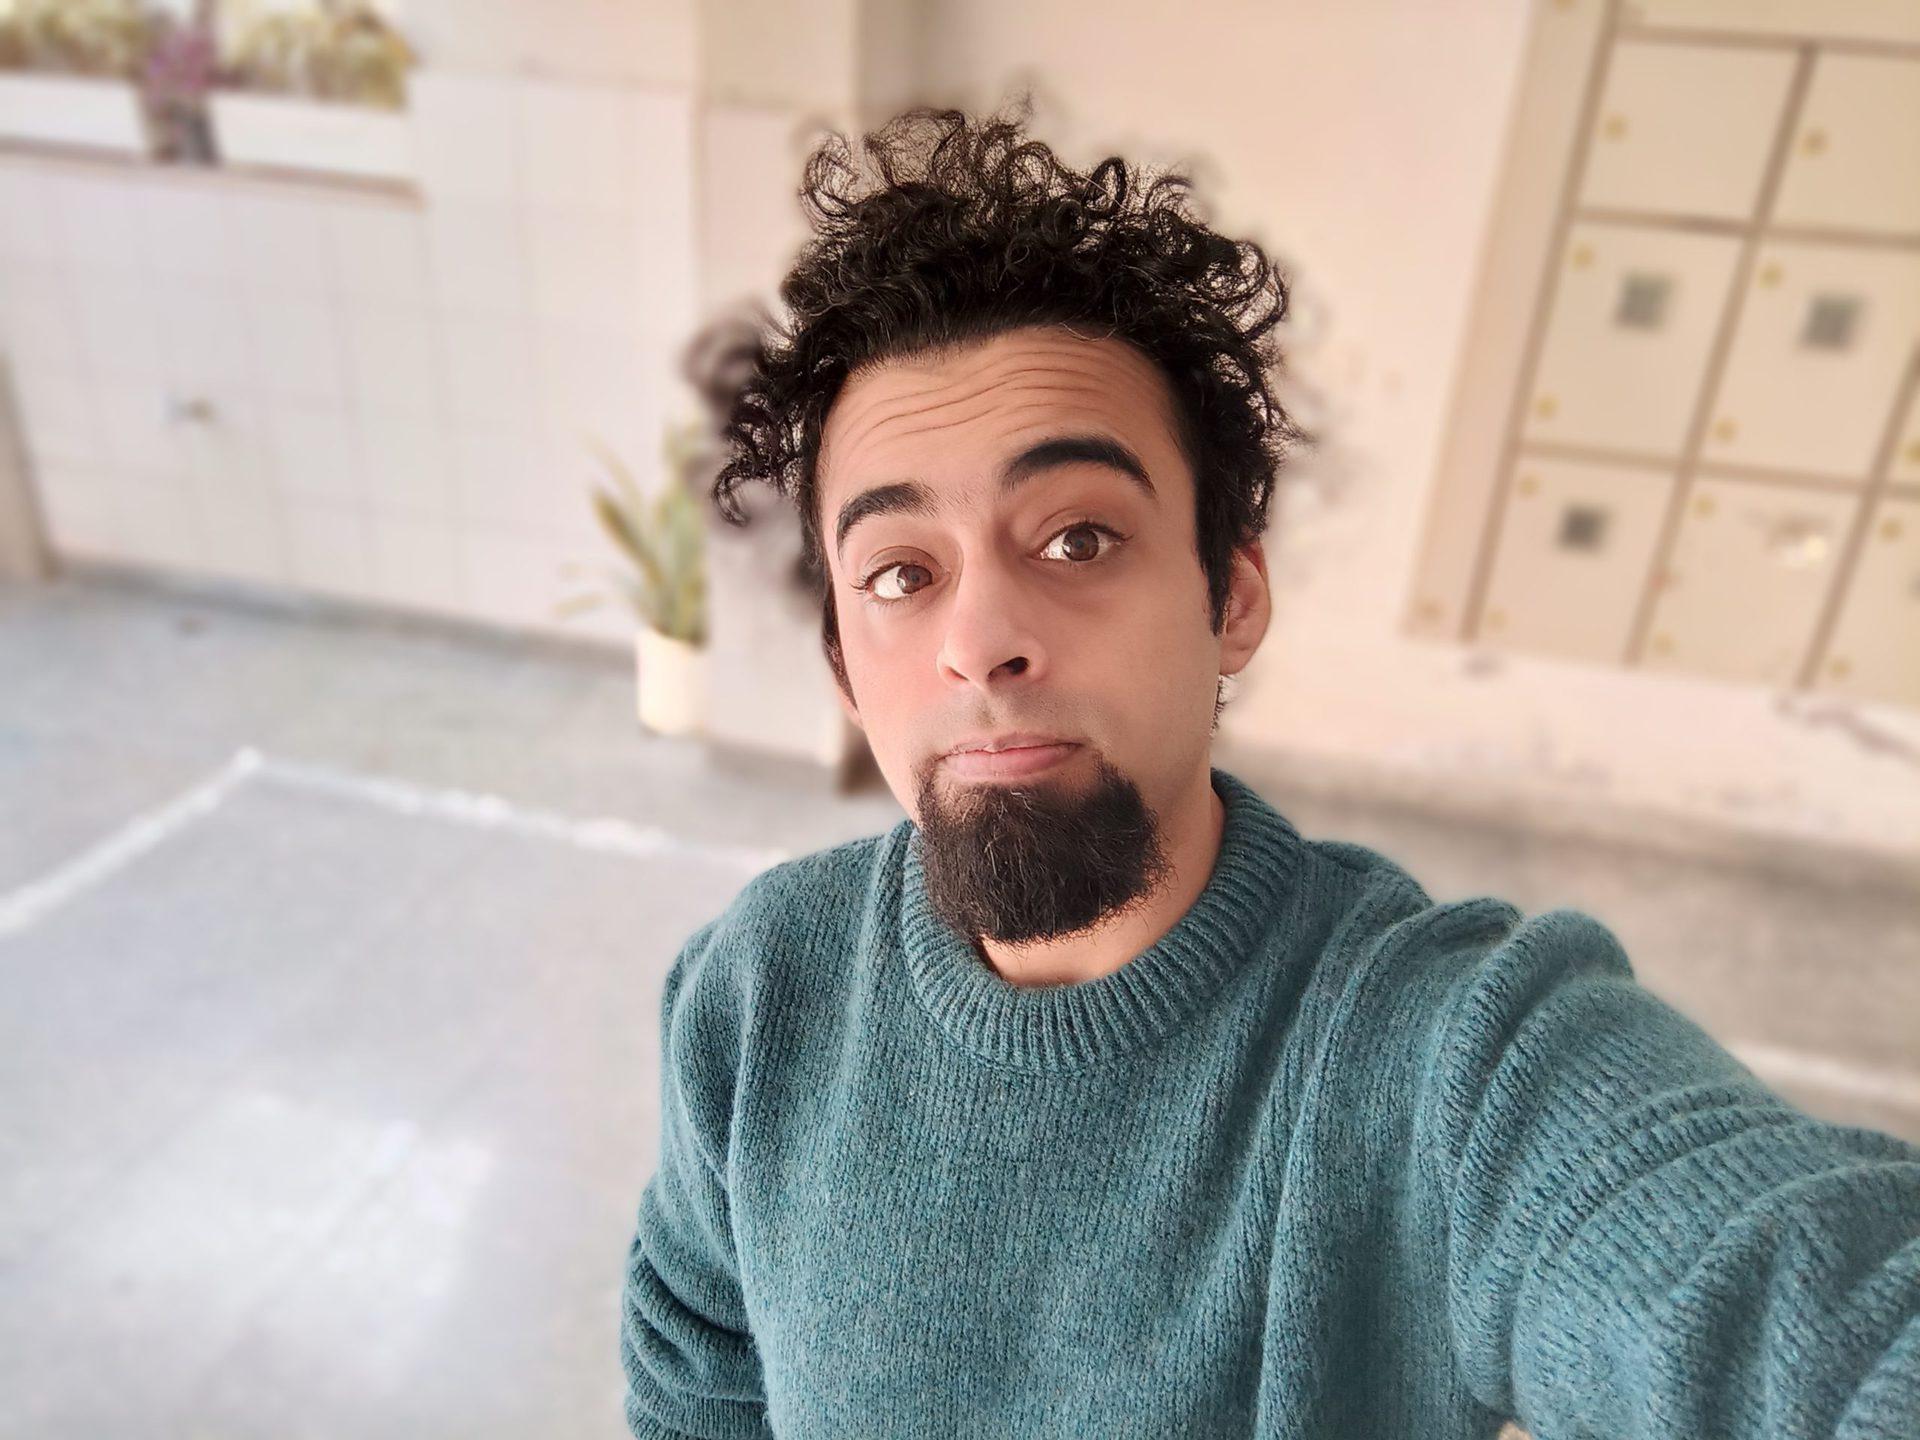 Realme X7 Pro camera sample selfie portrait mode